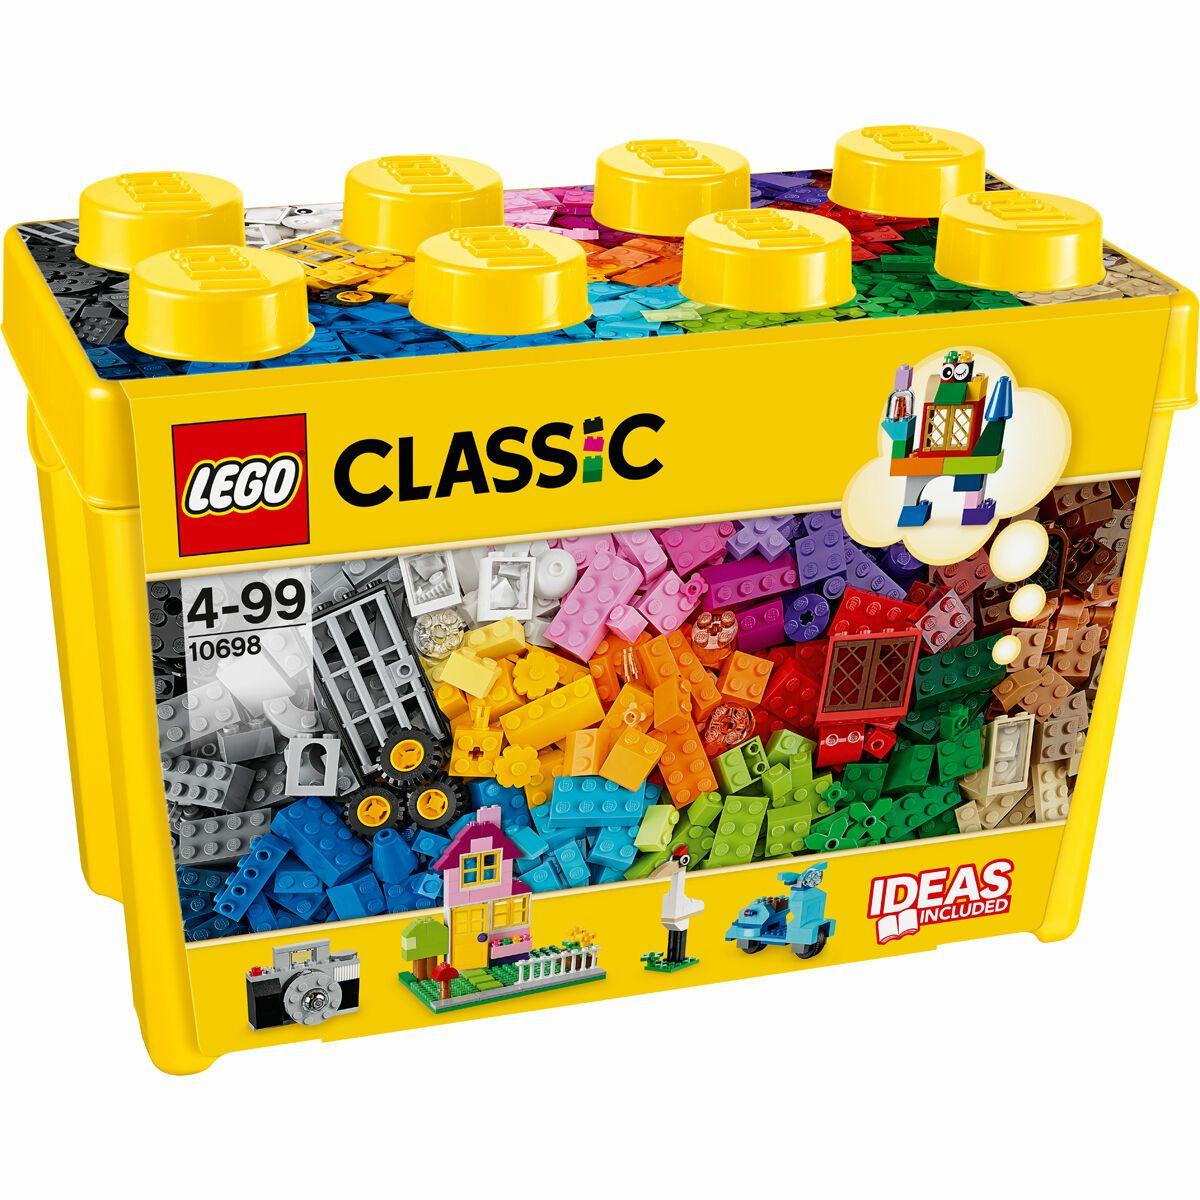 [Galeria.de Kundenkarte] LEGO Classic - Große Bausteine-Box 10698